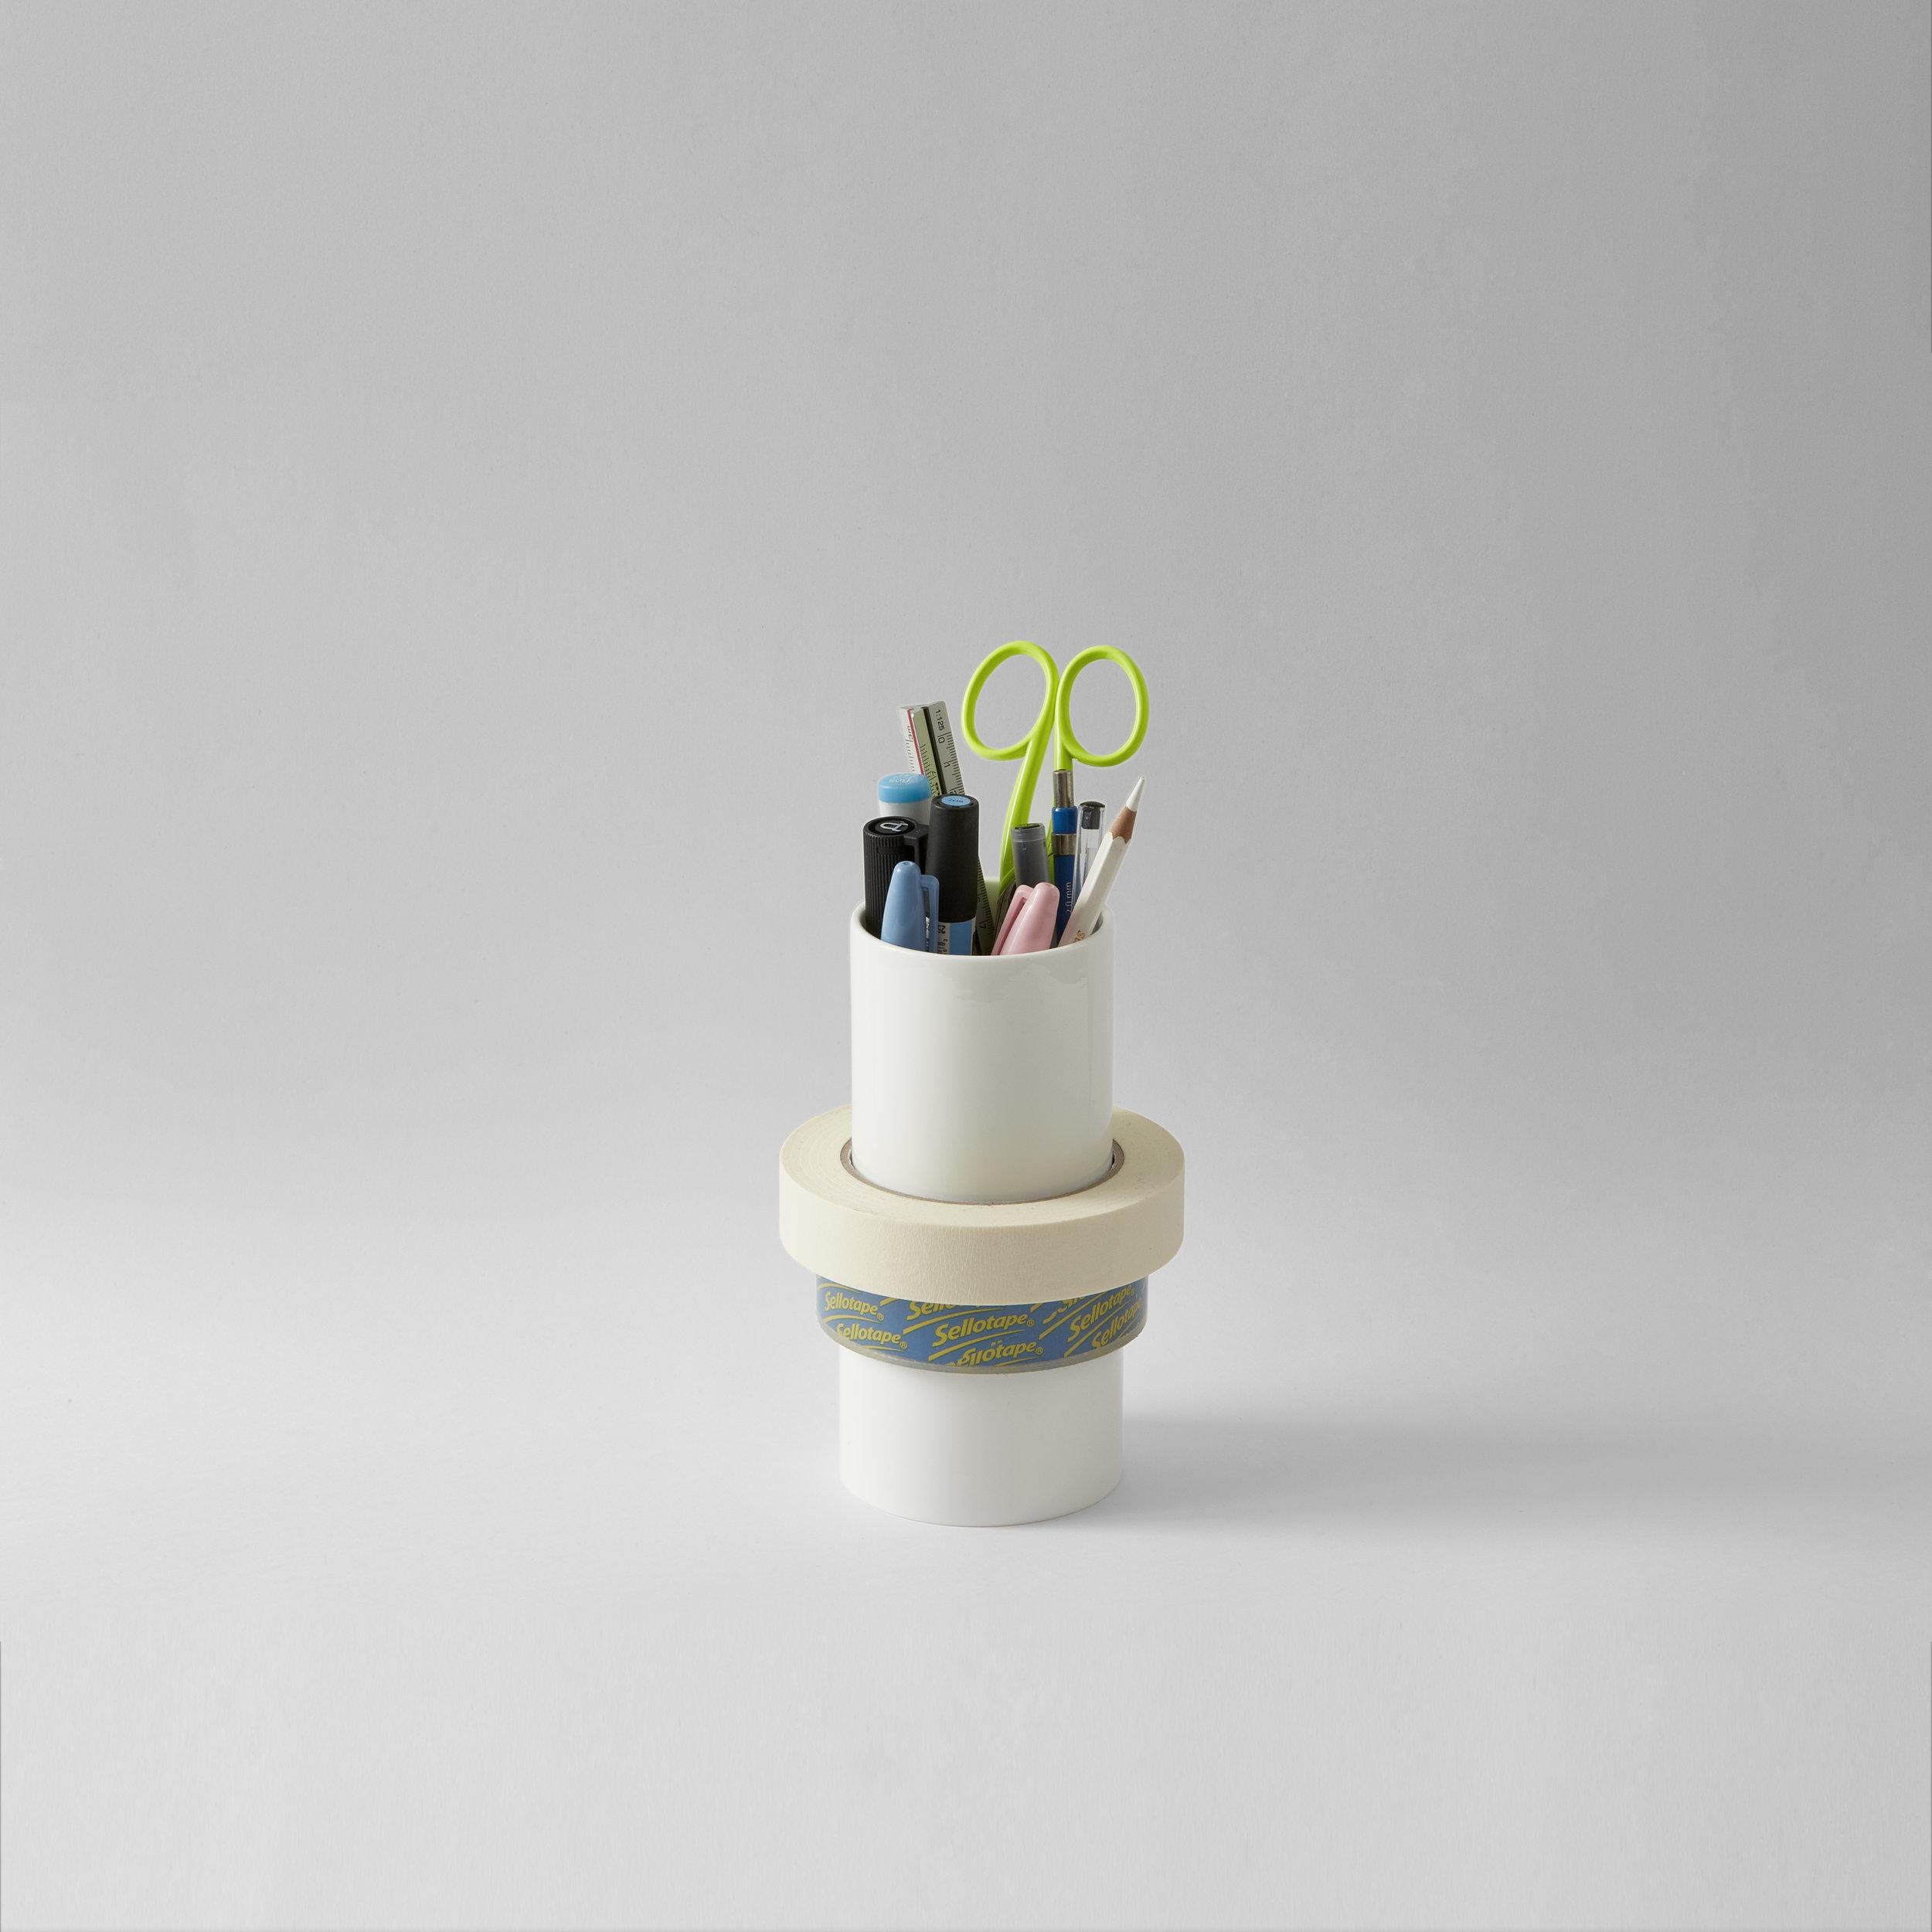 Tape Pot porcelain - Tape stacking & Dispensing£30.00